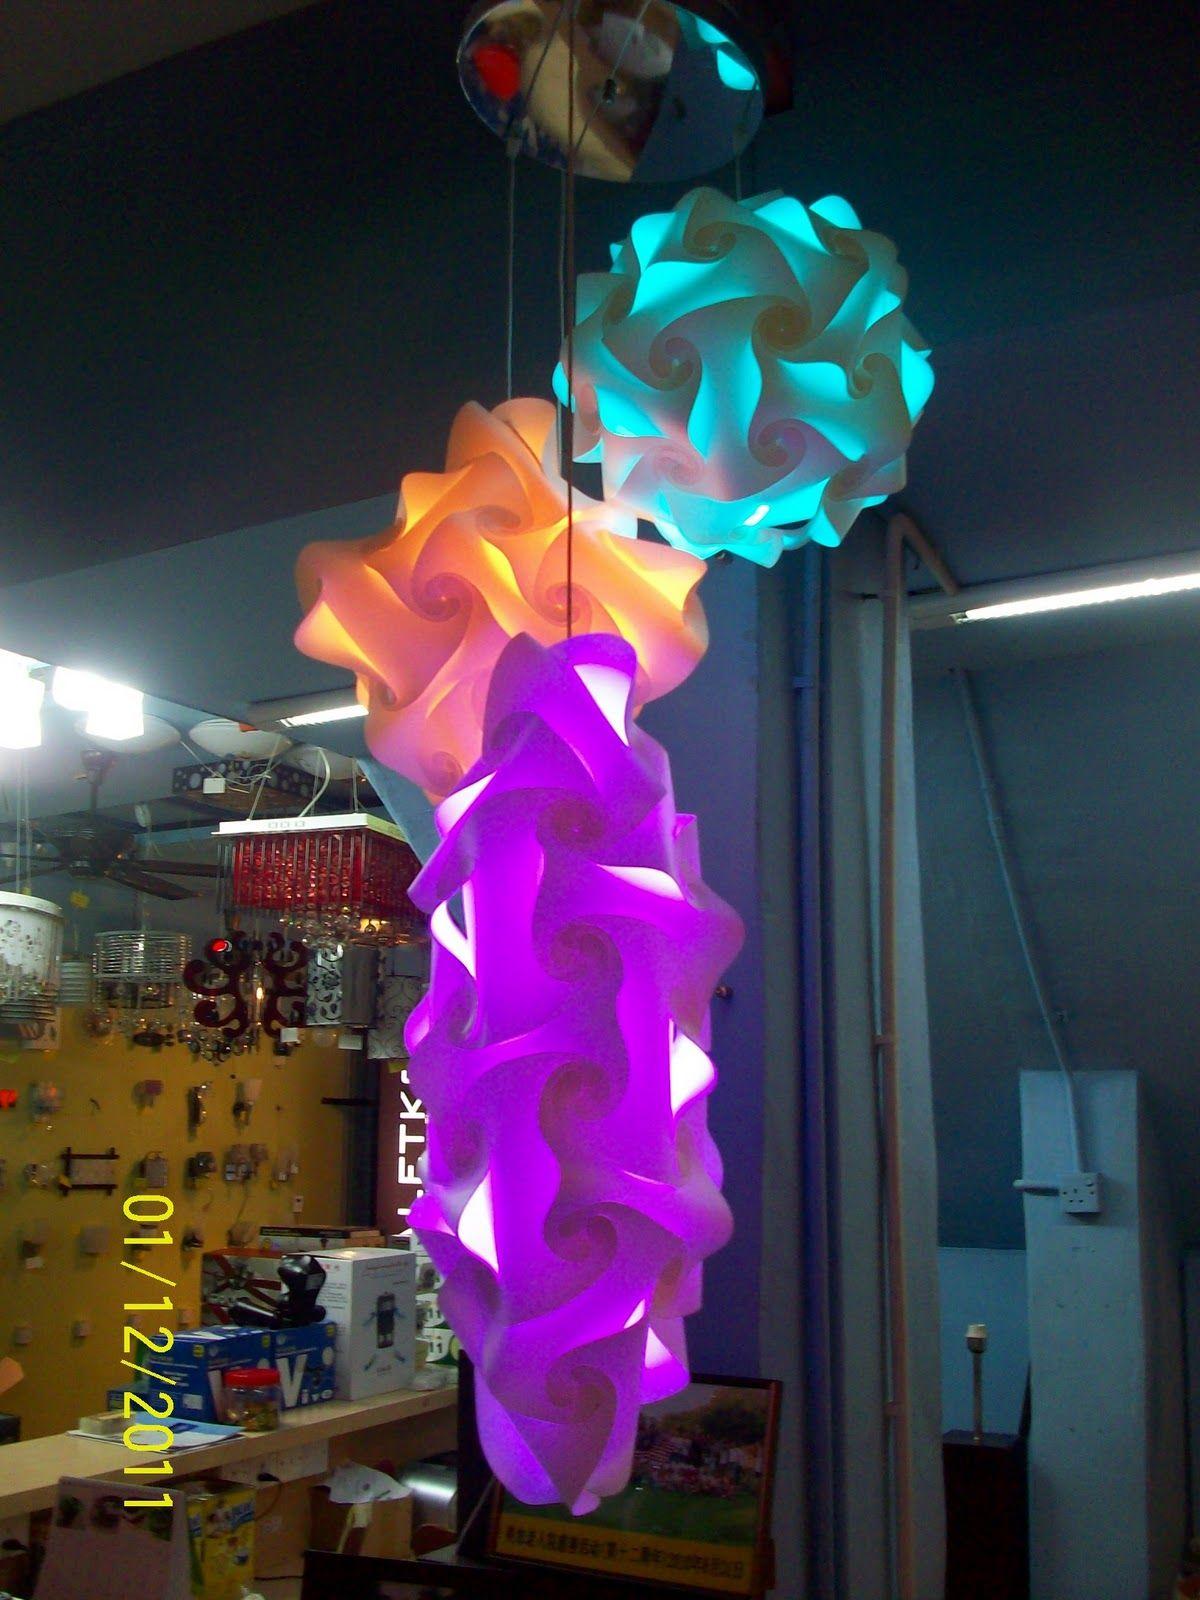 Vlightdeco Iq Light Puzzle Pendant Jigsaw Lamp Styles Iq Puzzle Puzzle Lights Crafts Lanterns